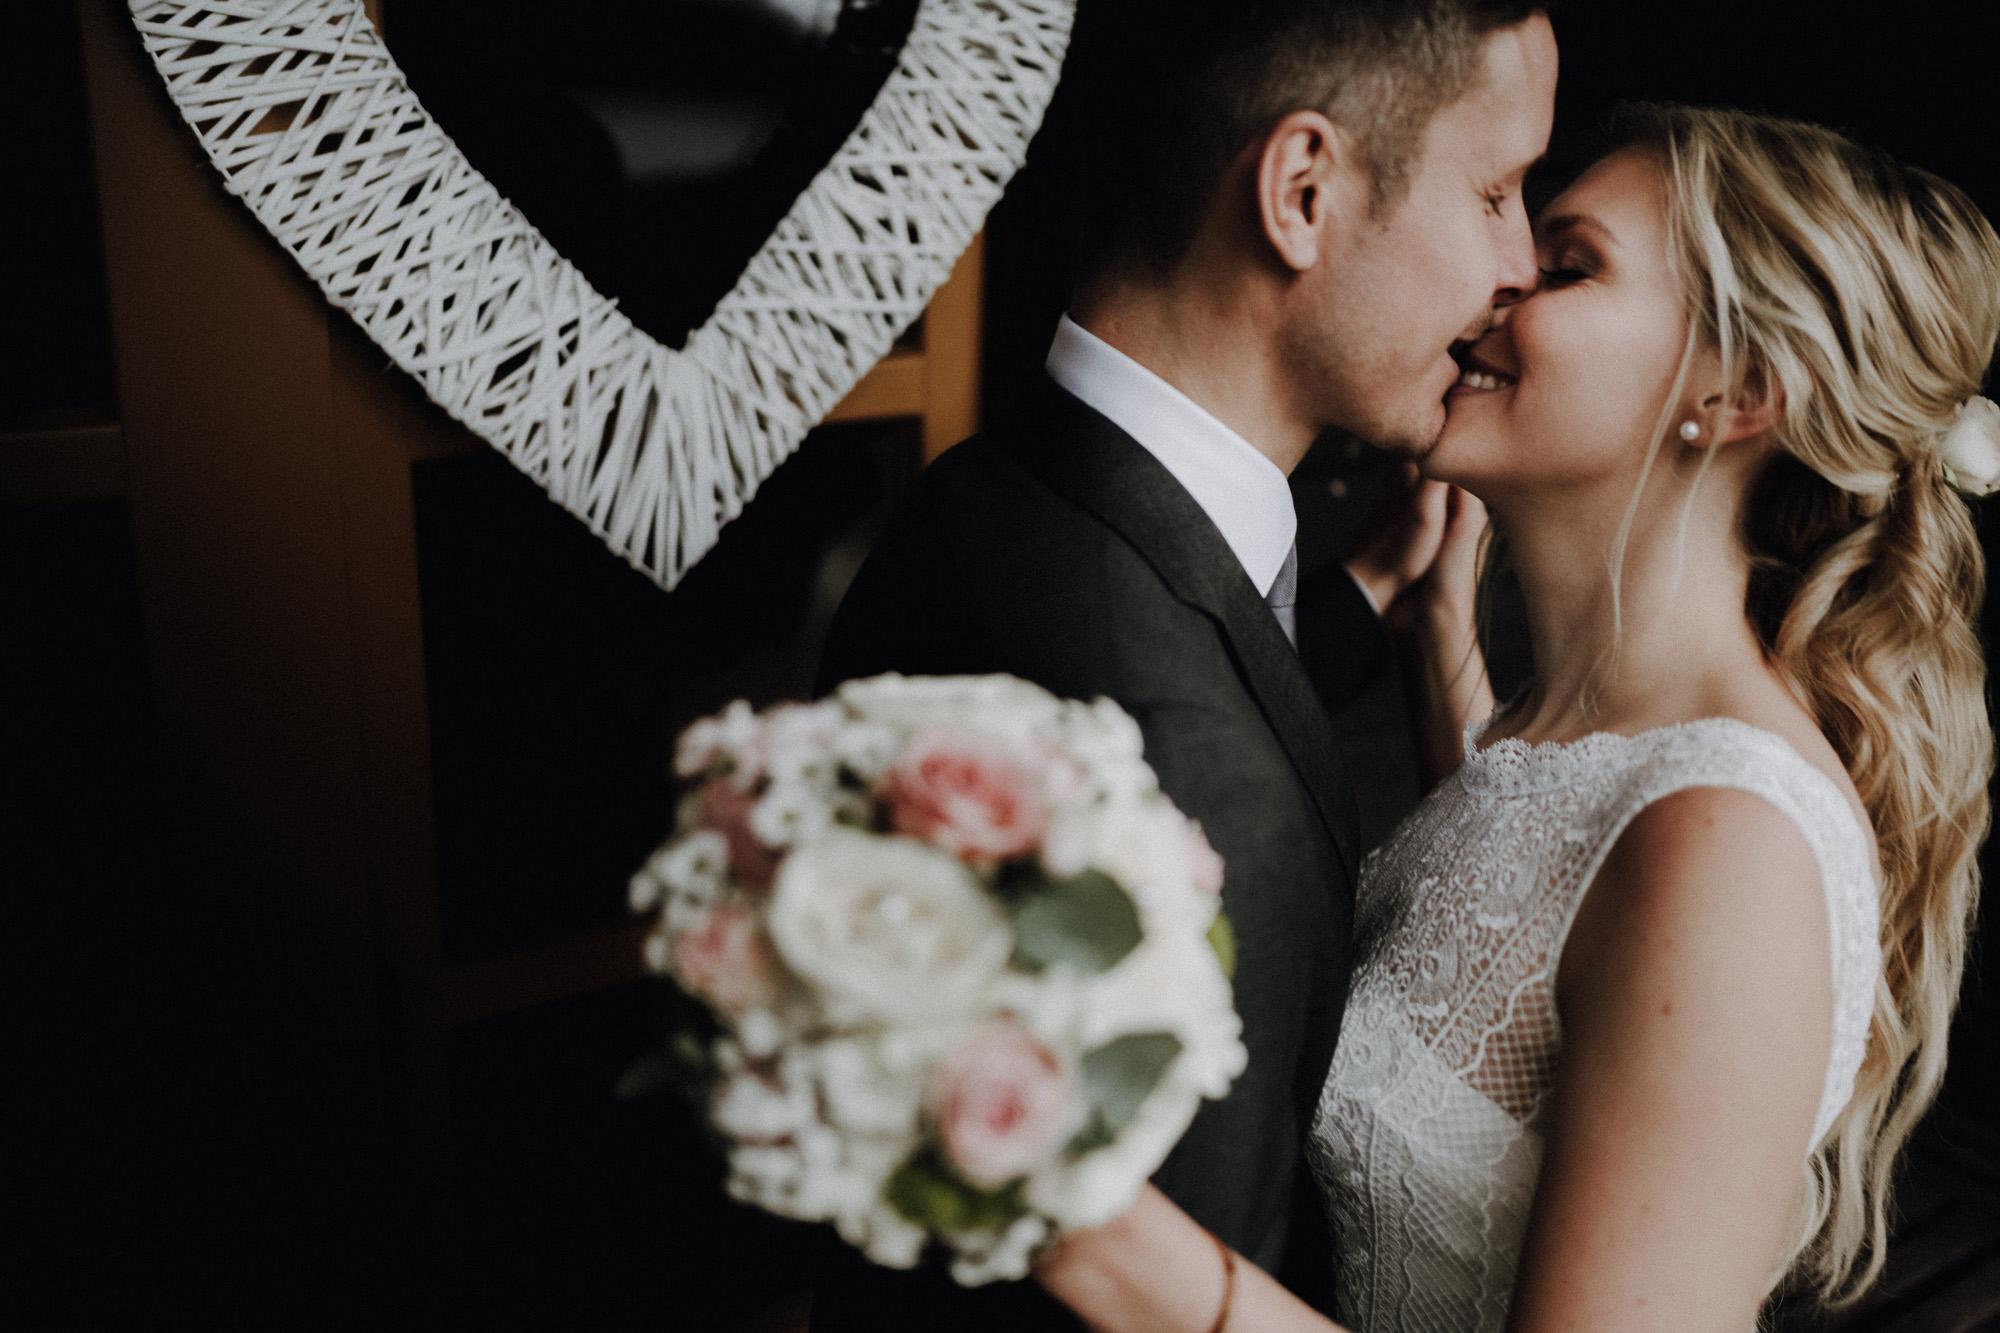 waltsmedia_weddingstorys-16